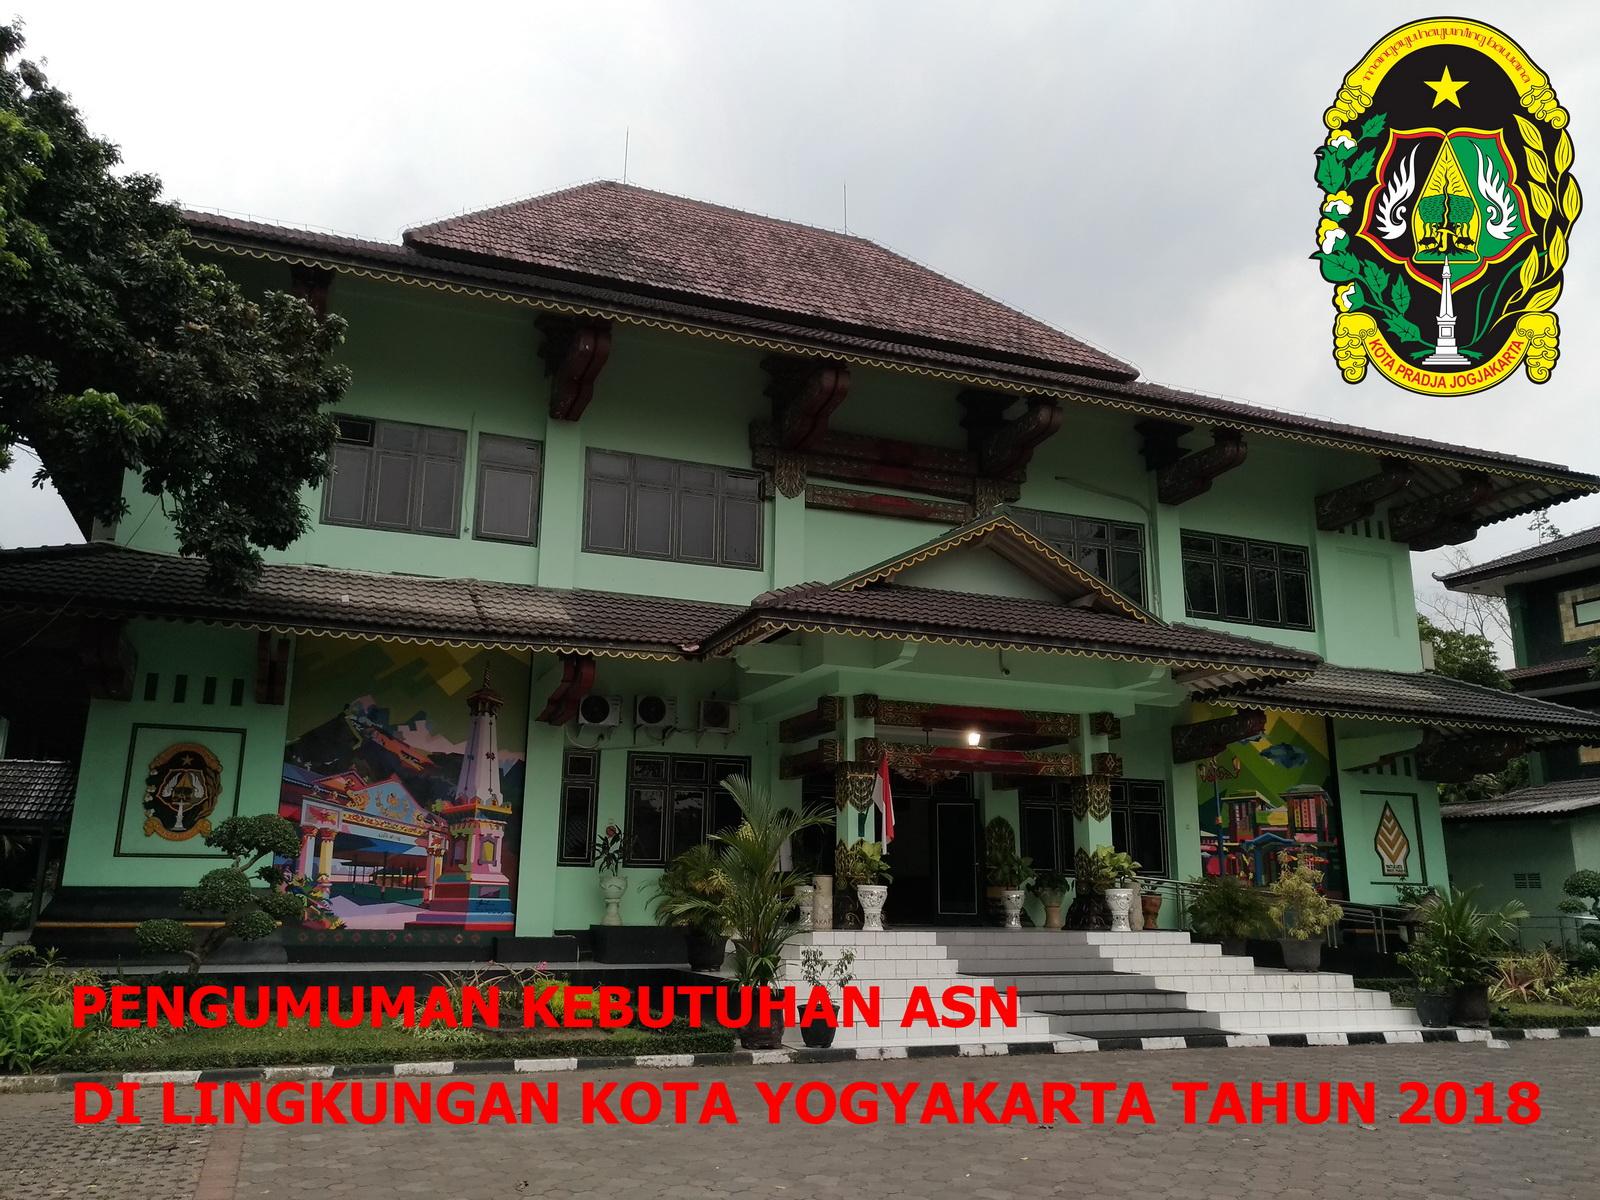 Pengumuman Pendaftaran CPNS Kota Yogyakarta Tahun 2018